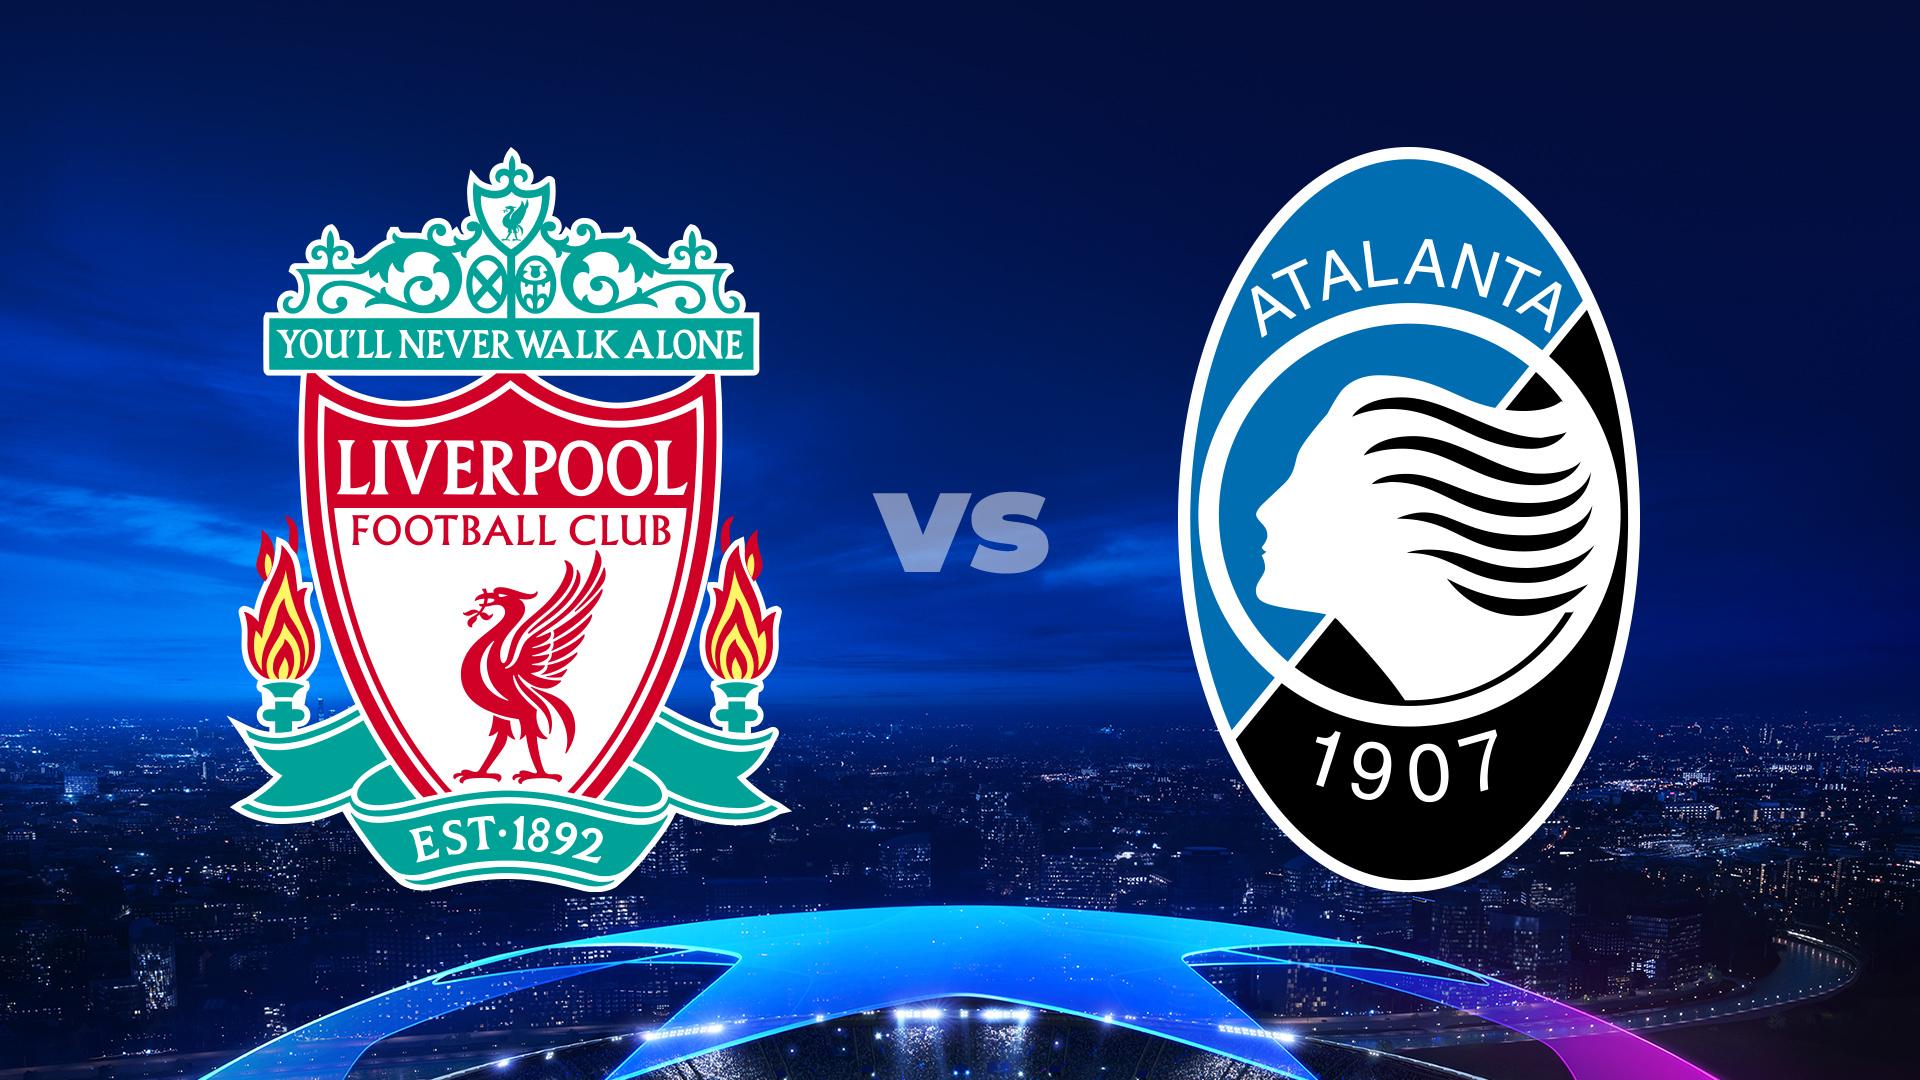 Liverpool FC - Atalanta Bergamo